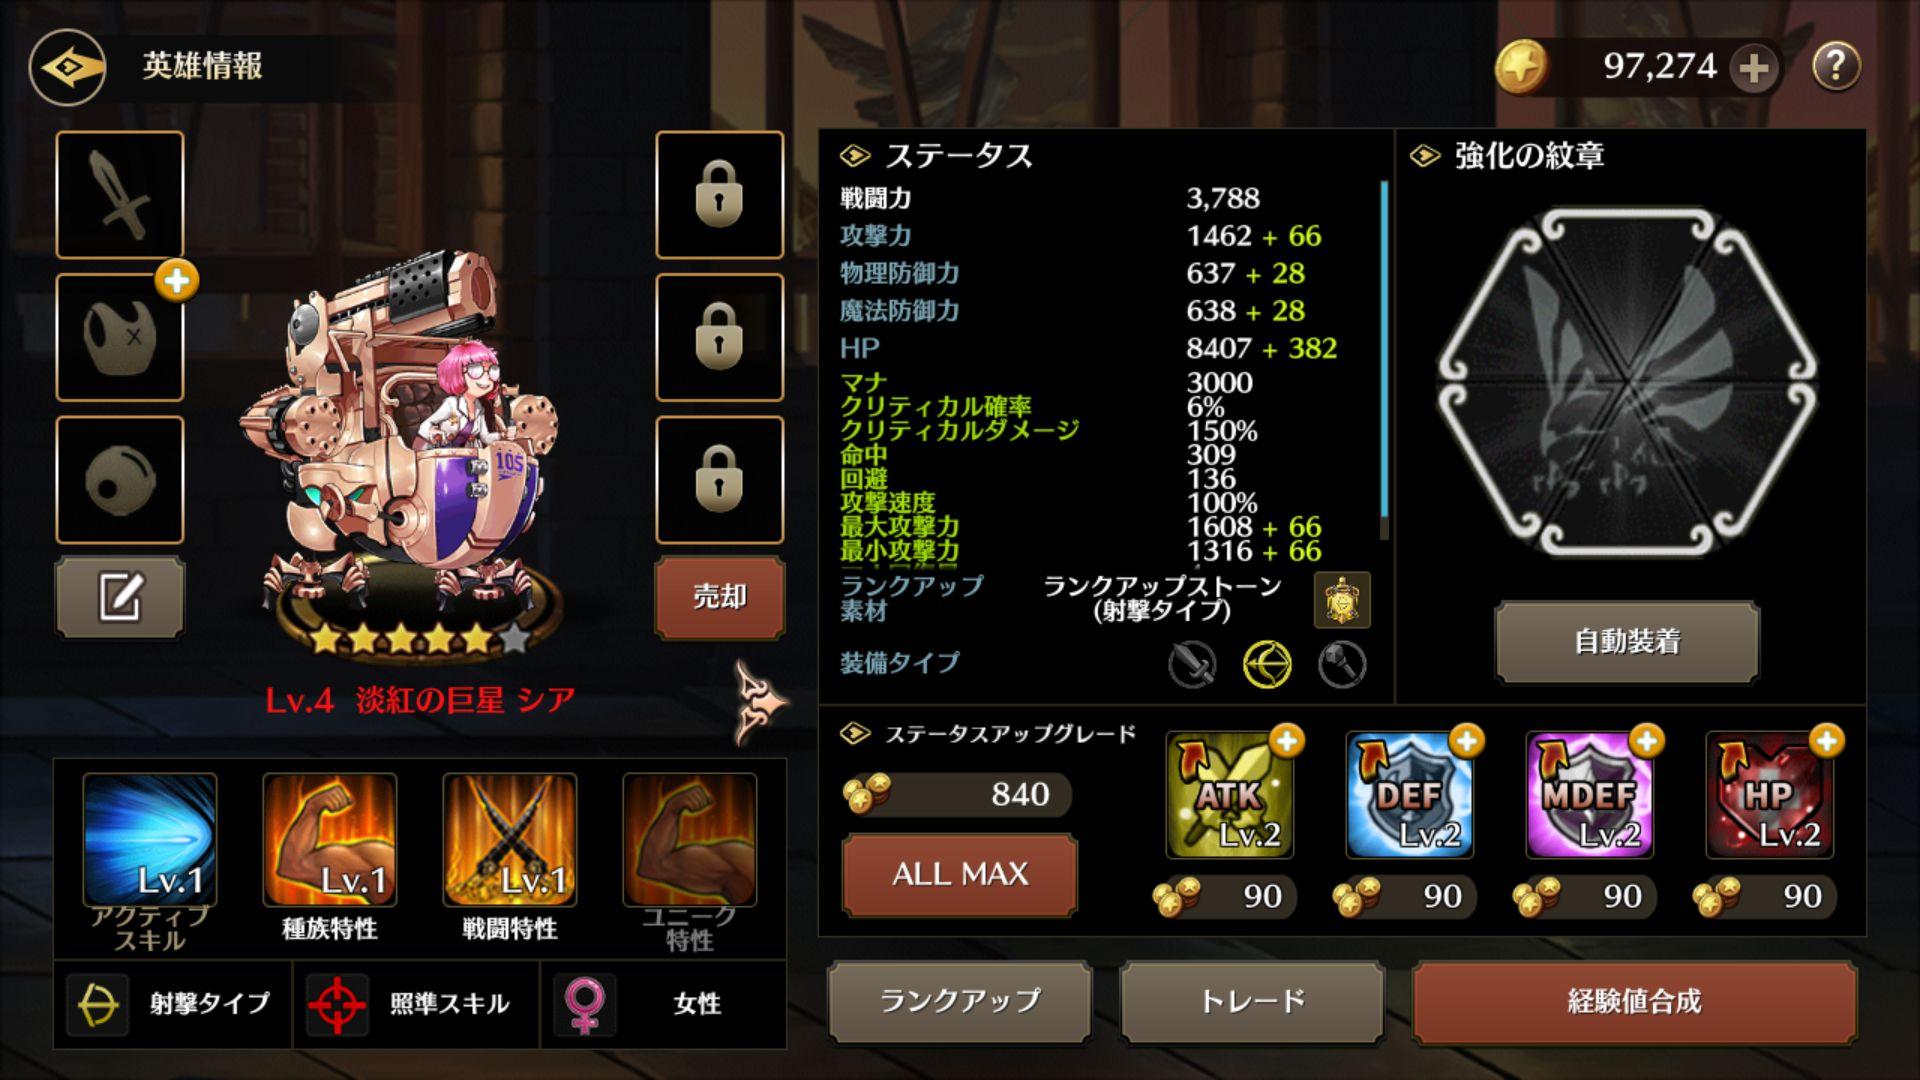 androidアプリ カオスクロニクル(Chaos Chronicle)攻略スクリーンショット5